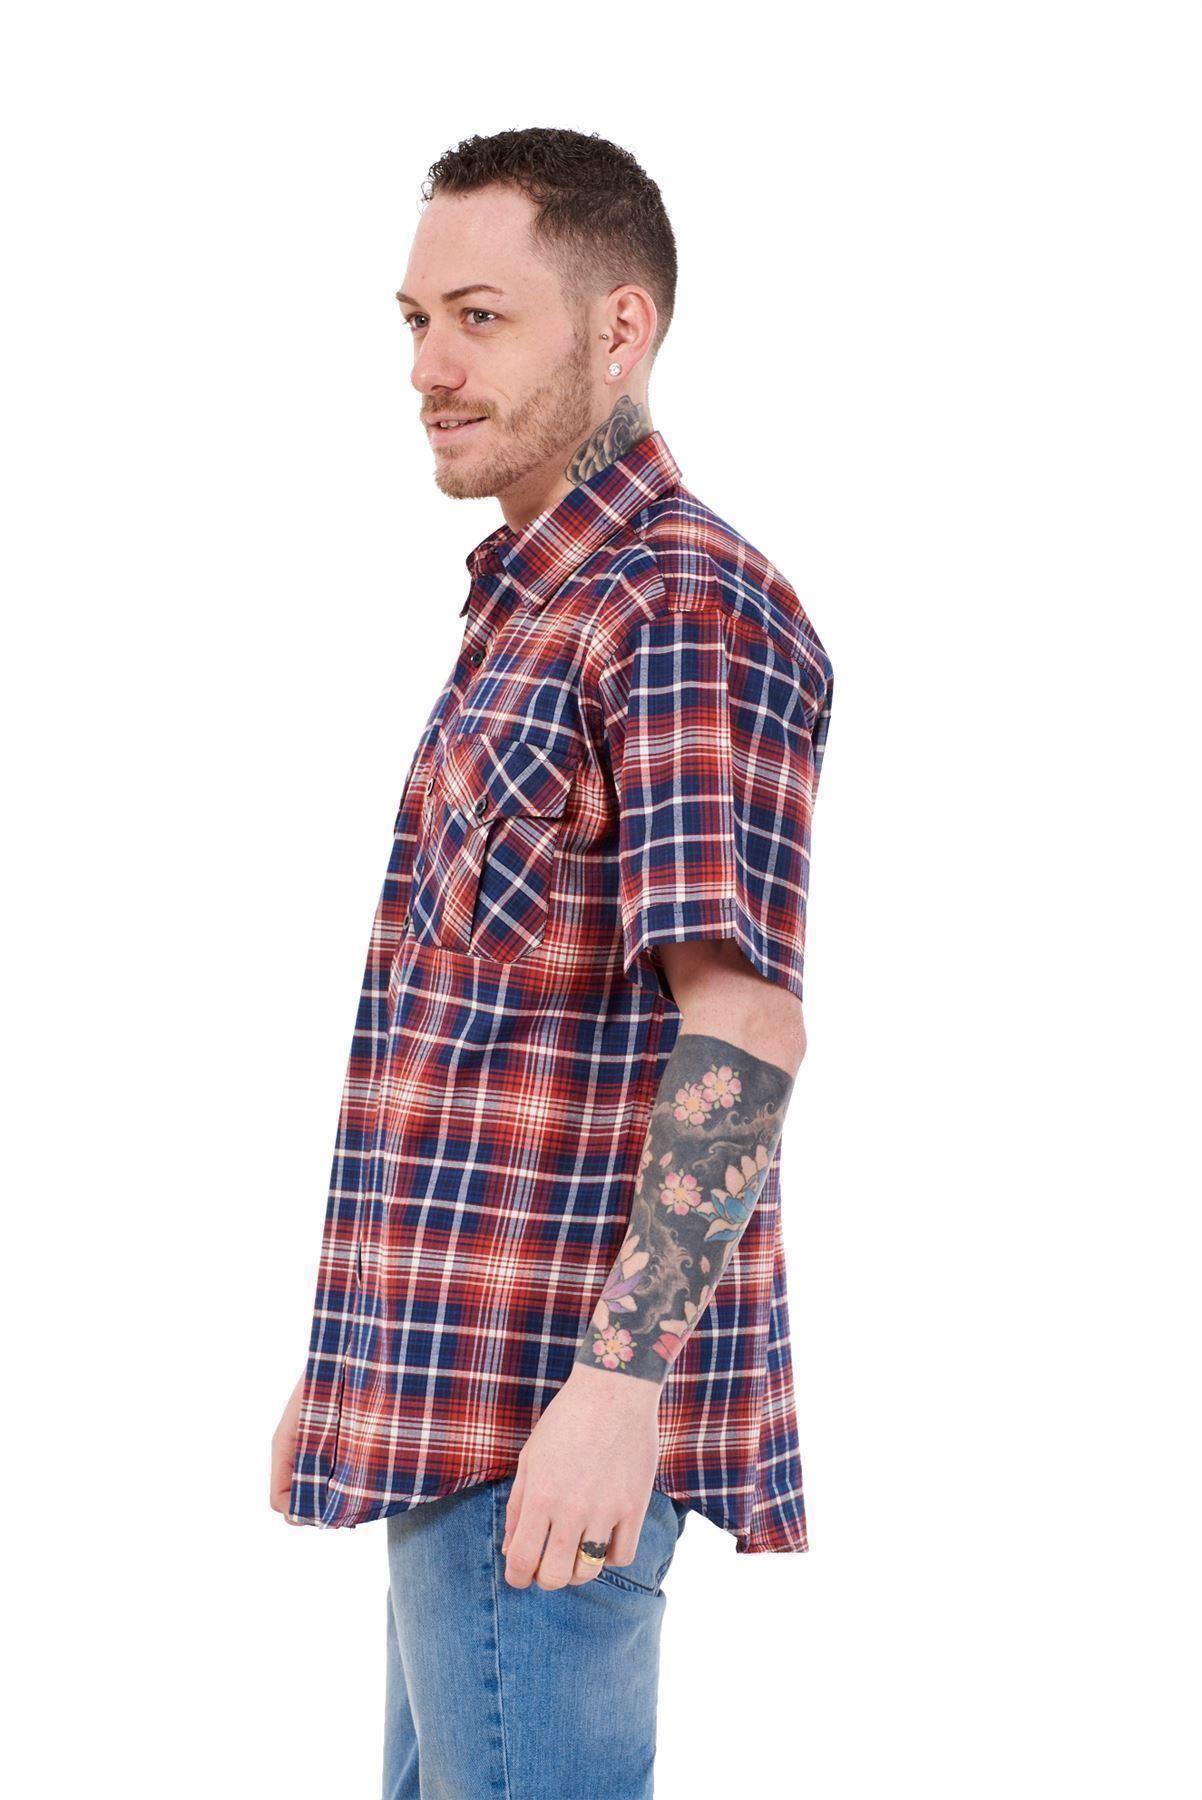 Mens-Regular-Big-Size-Shirts-Checked-Cotton-Blend-Casual-Short-Sleeve-Blue-M-5XL thumbnail 27